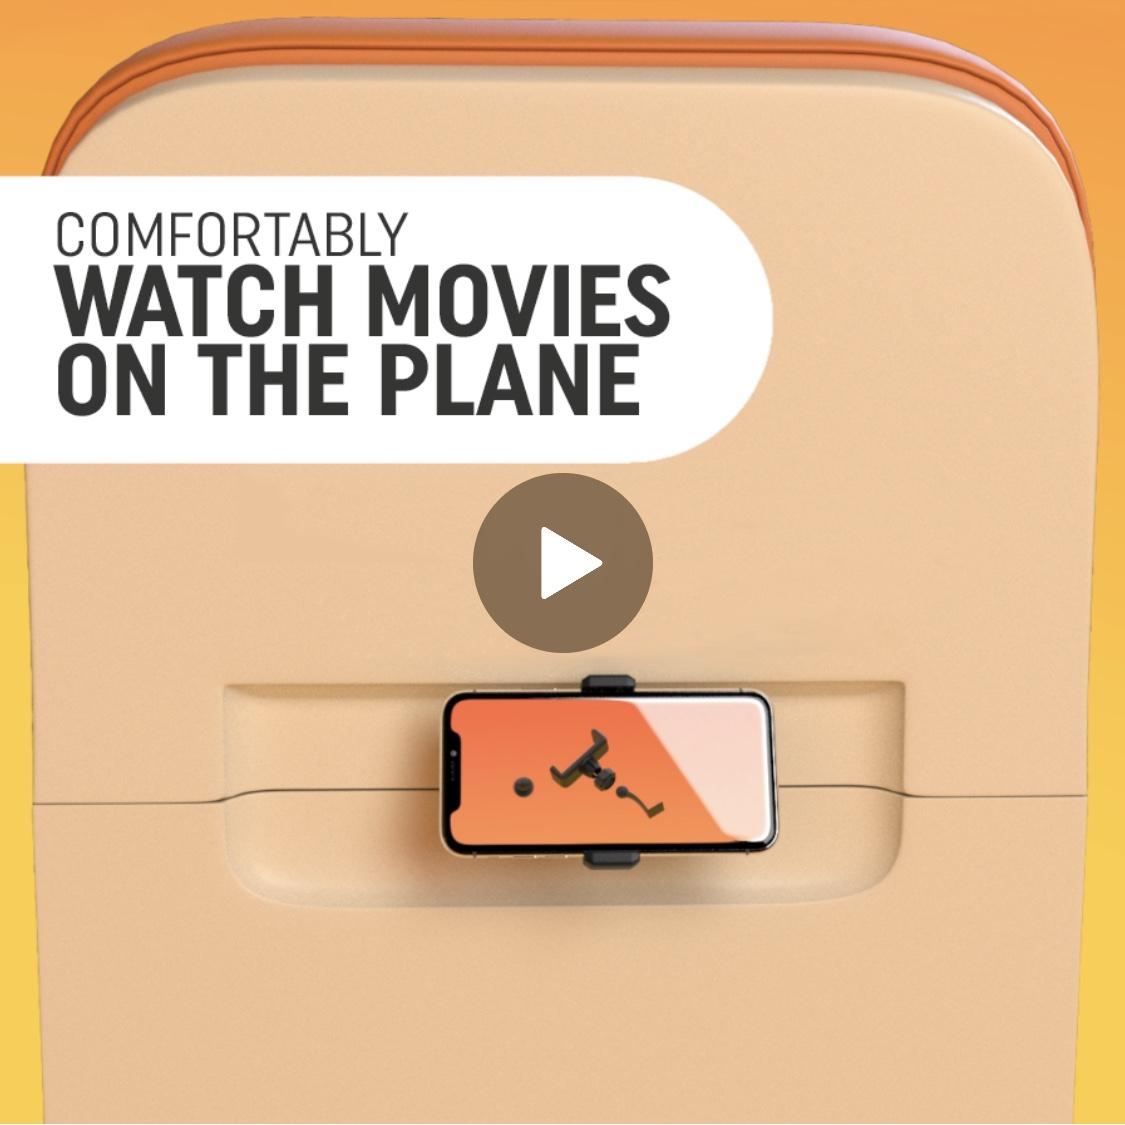 Plane phone holder